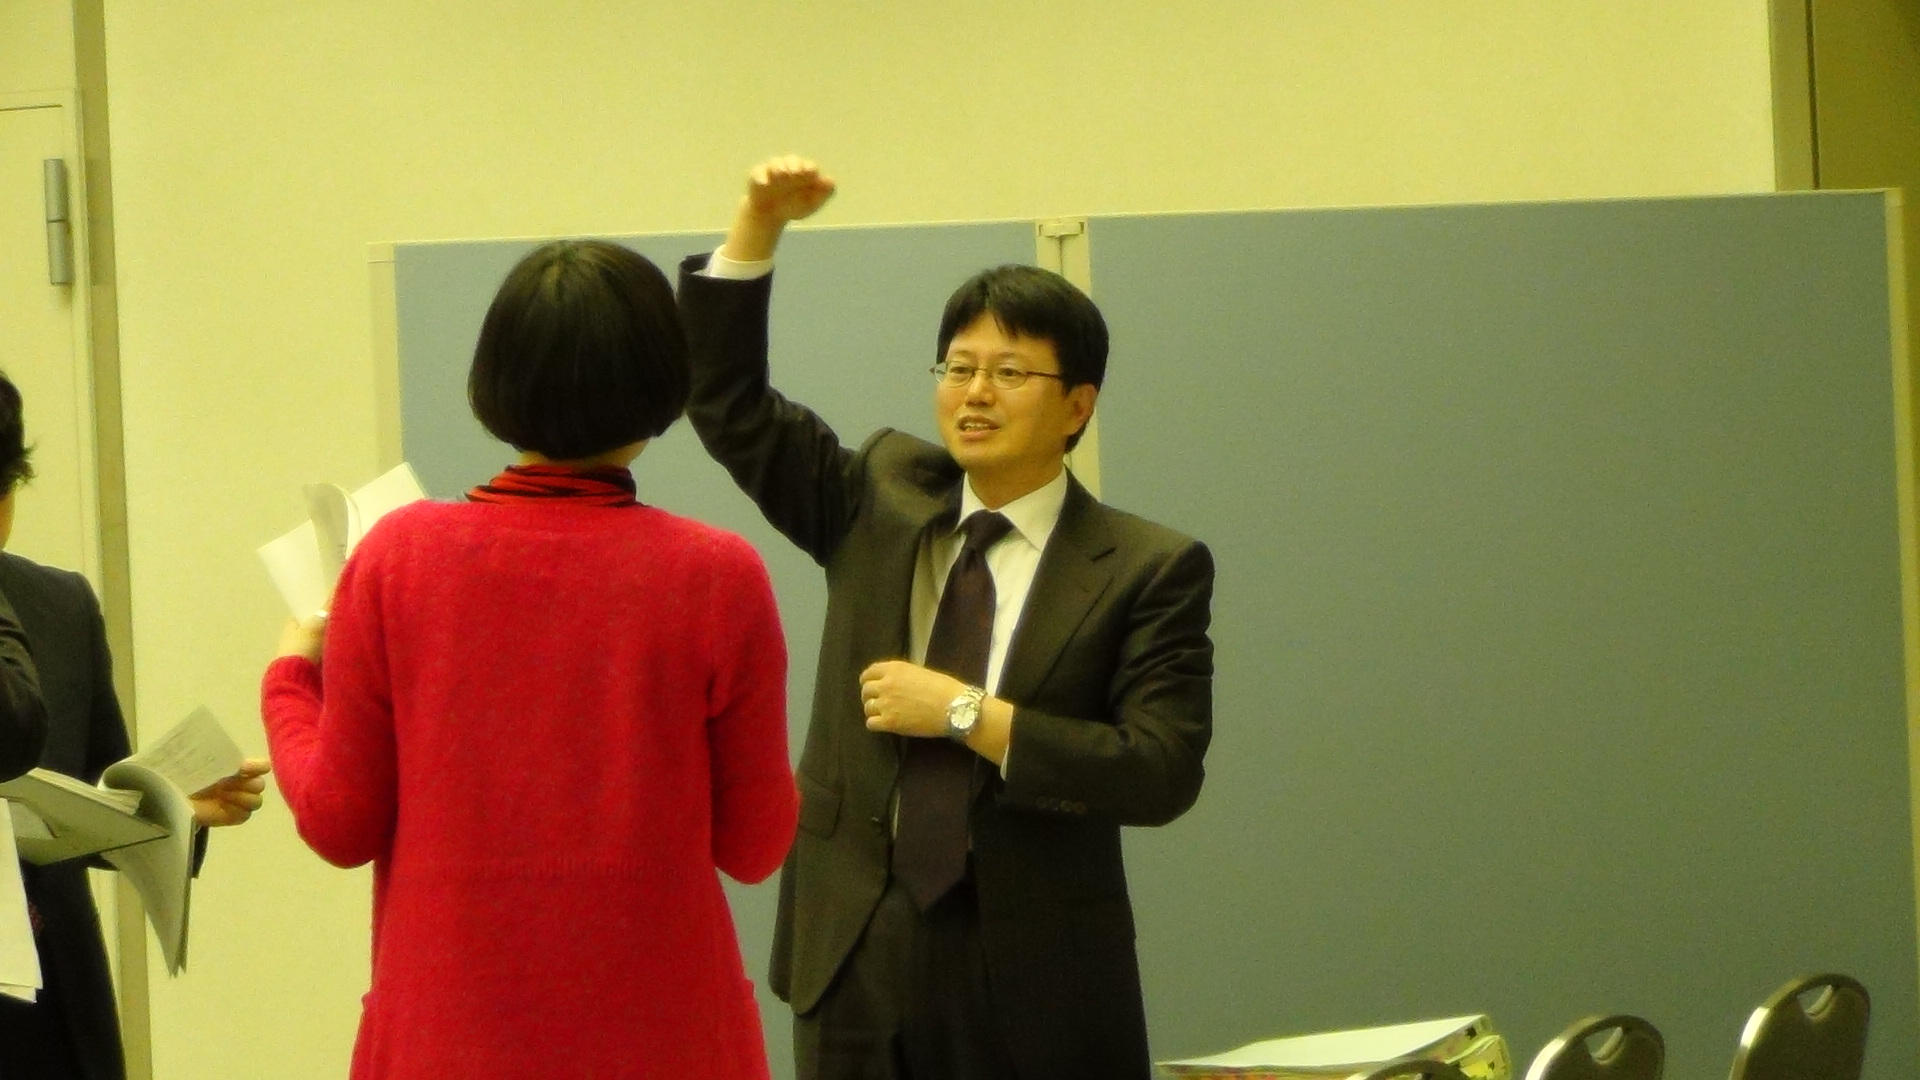 http://daily.magazine9.jp/m9/oshidori/DSC01532%5B1%5D.JPG